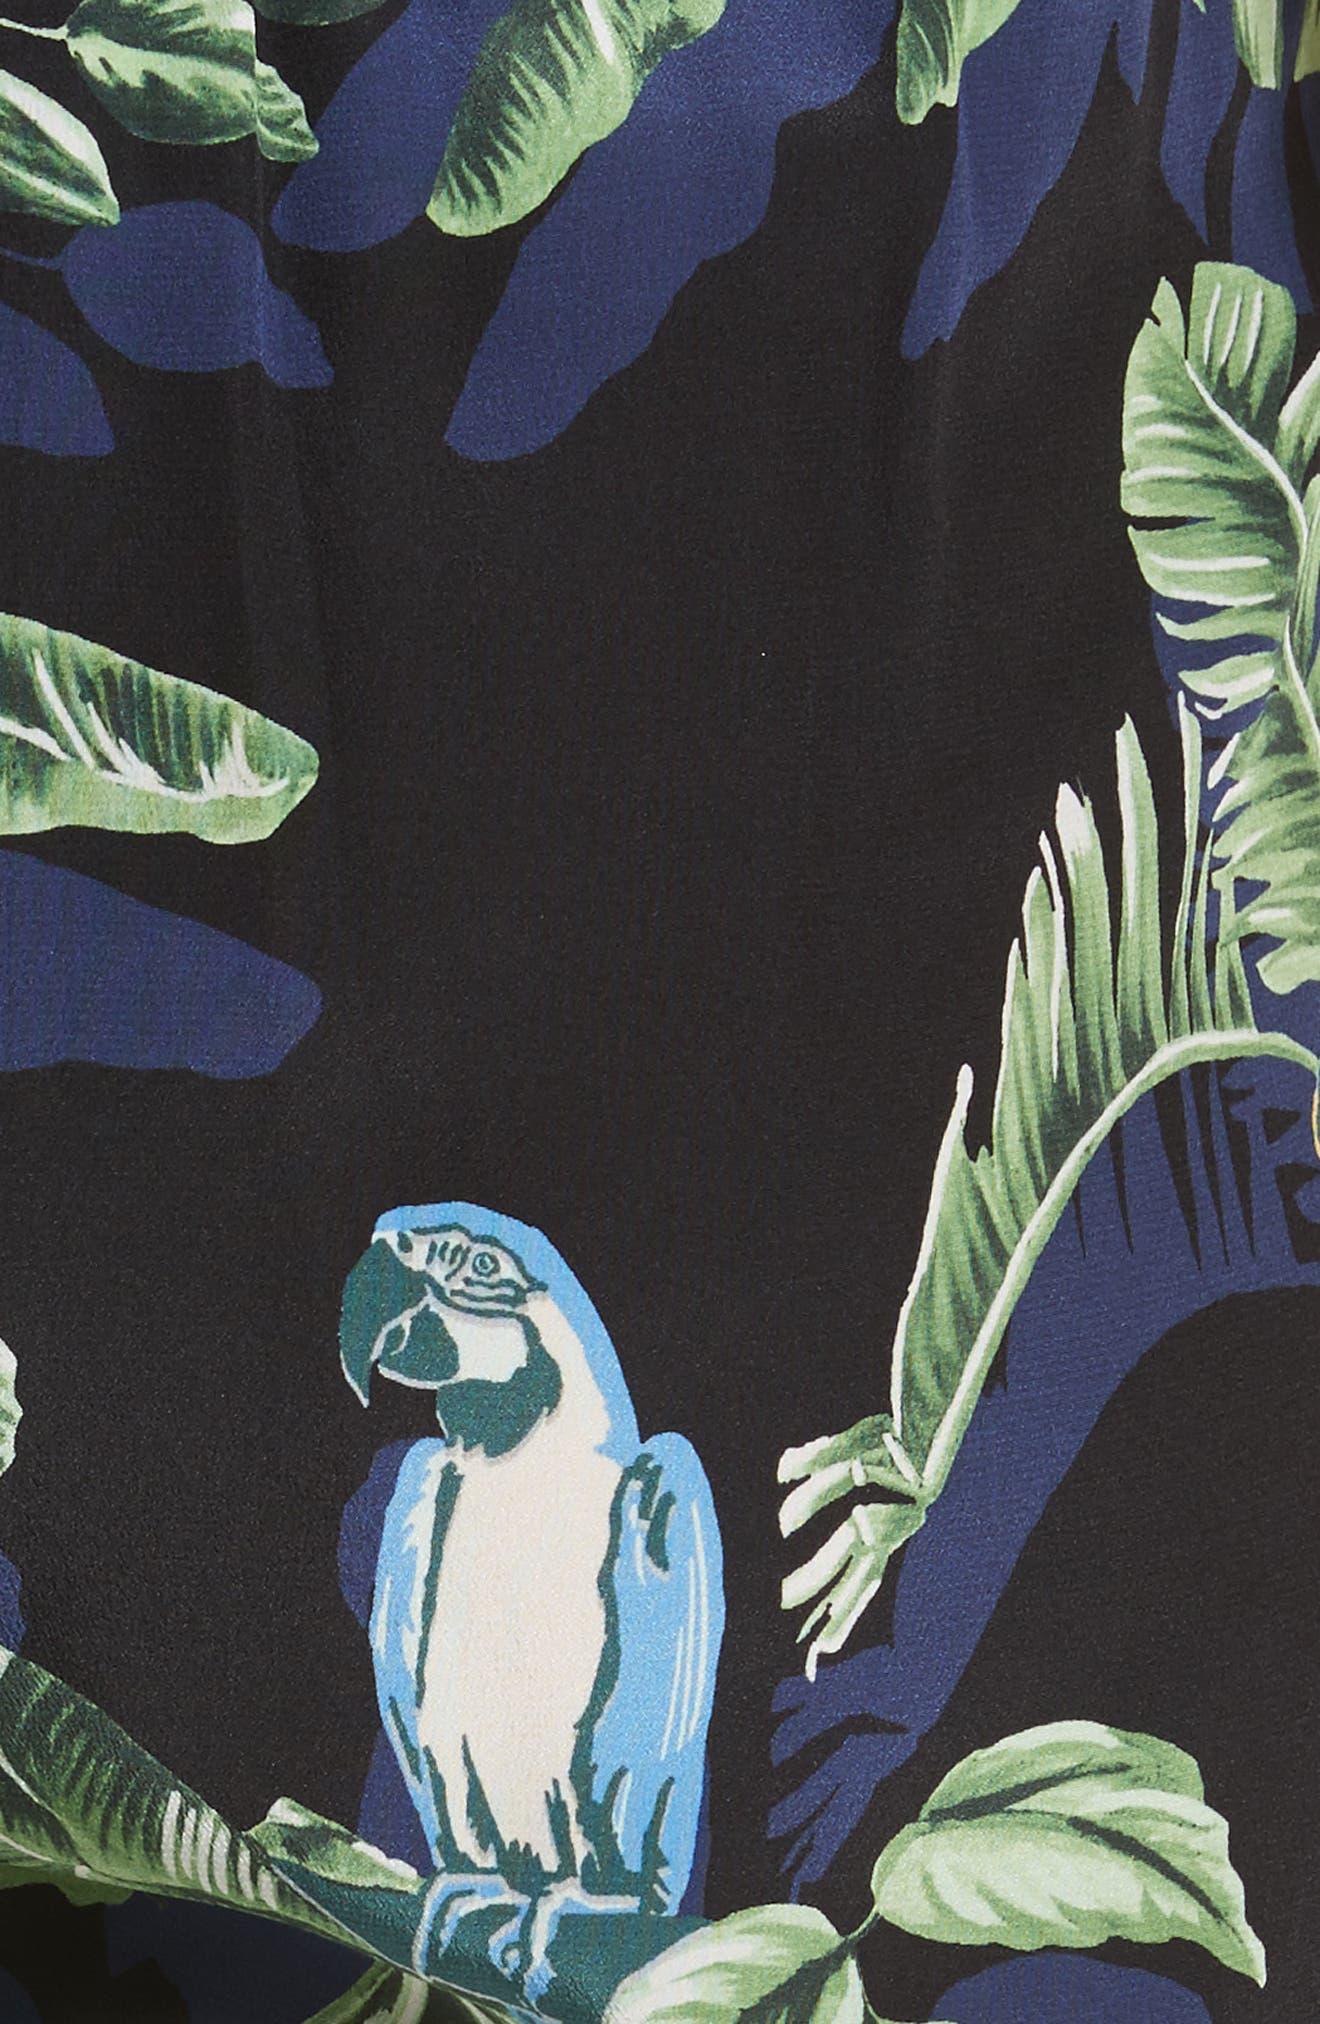 Birds of Paradise Silk Crêpe de Chine Pants,                             Alternate thumbnail 6, color,                             Black